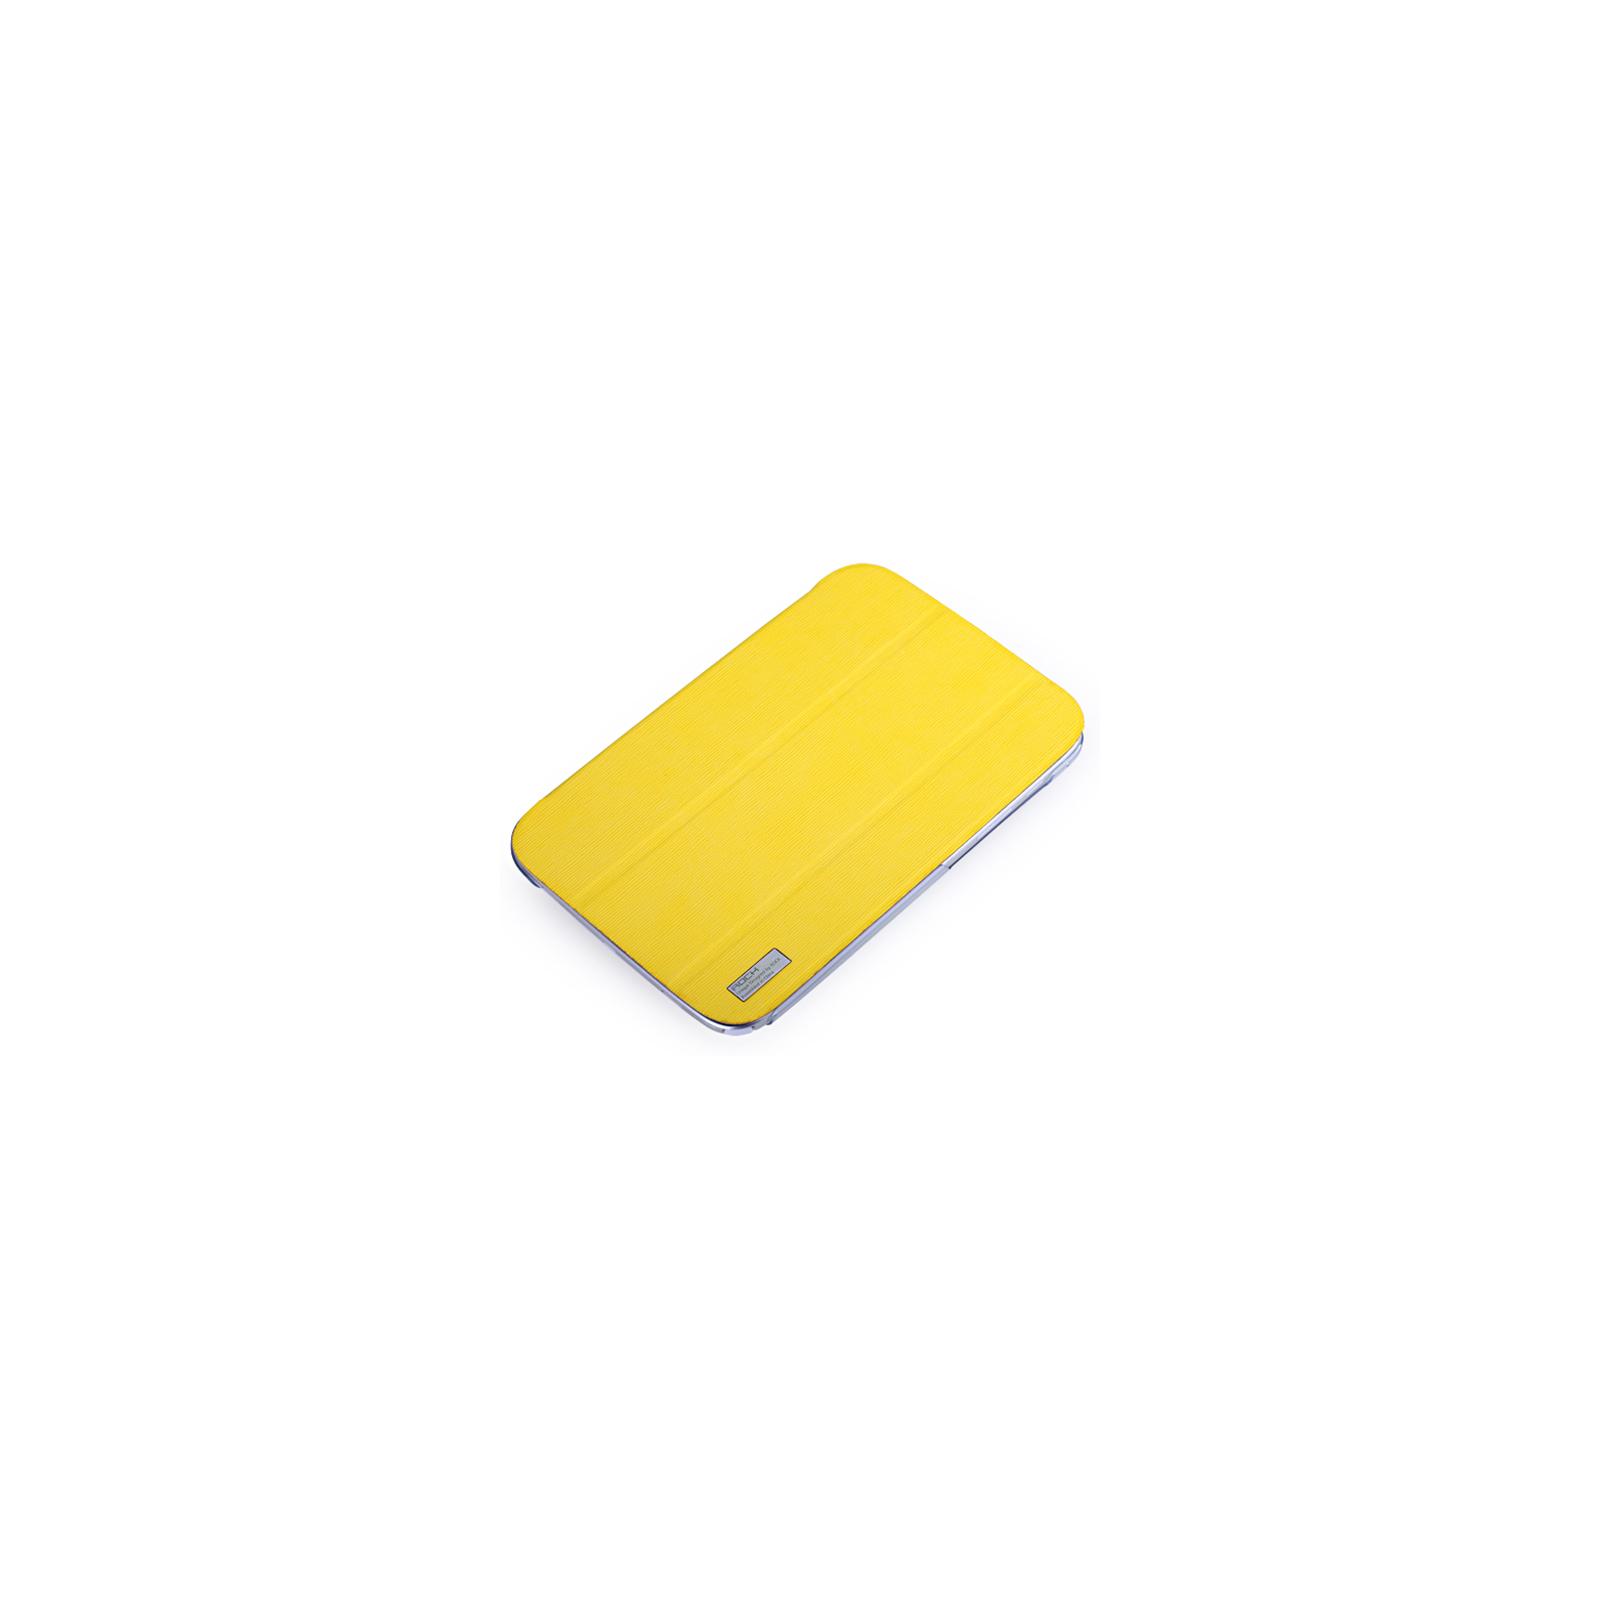 "Чехол для планшета Rock 8"" Rock Samsung Note 8.0 N5100 new elegant series lemon yell (6950290628306)"